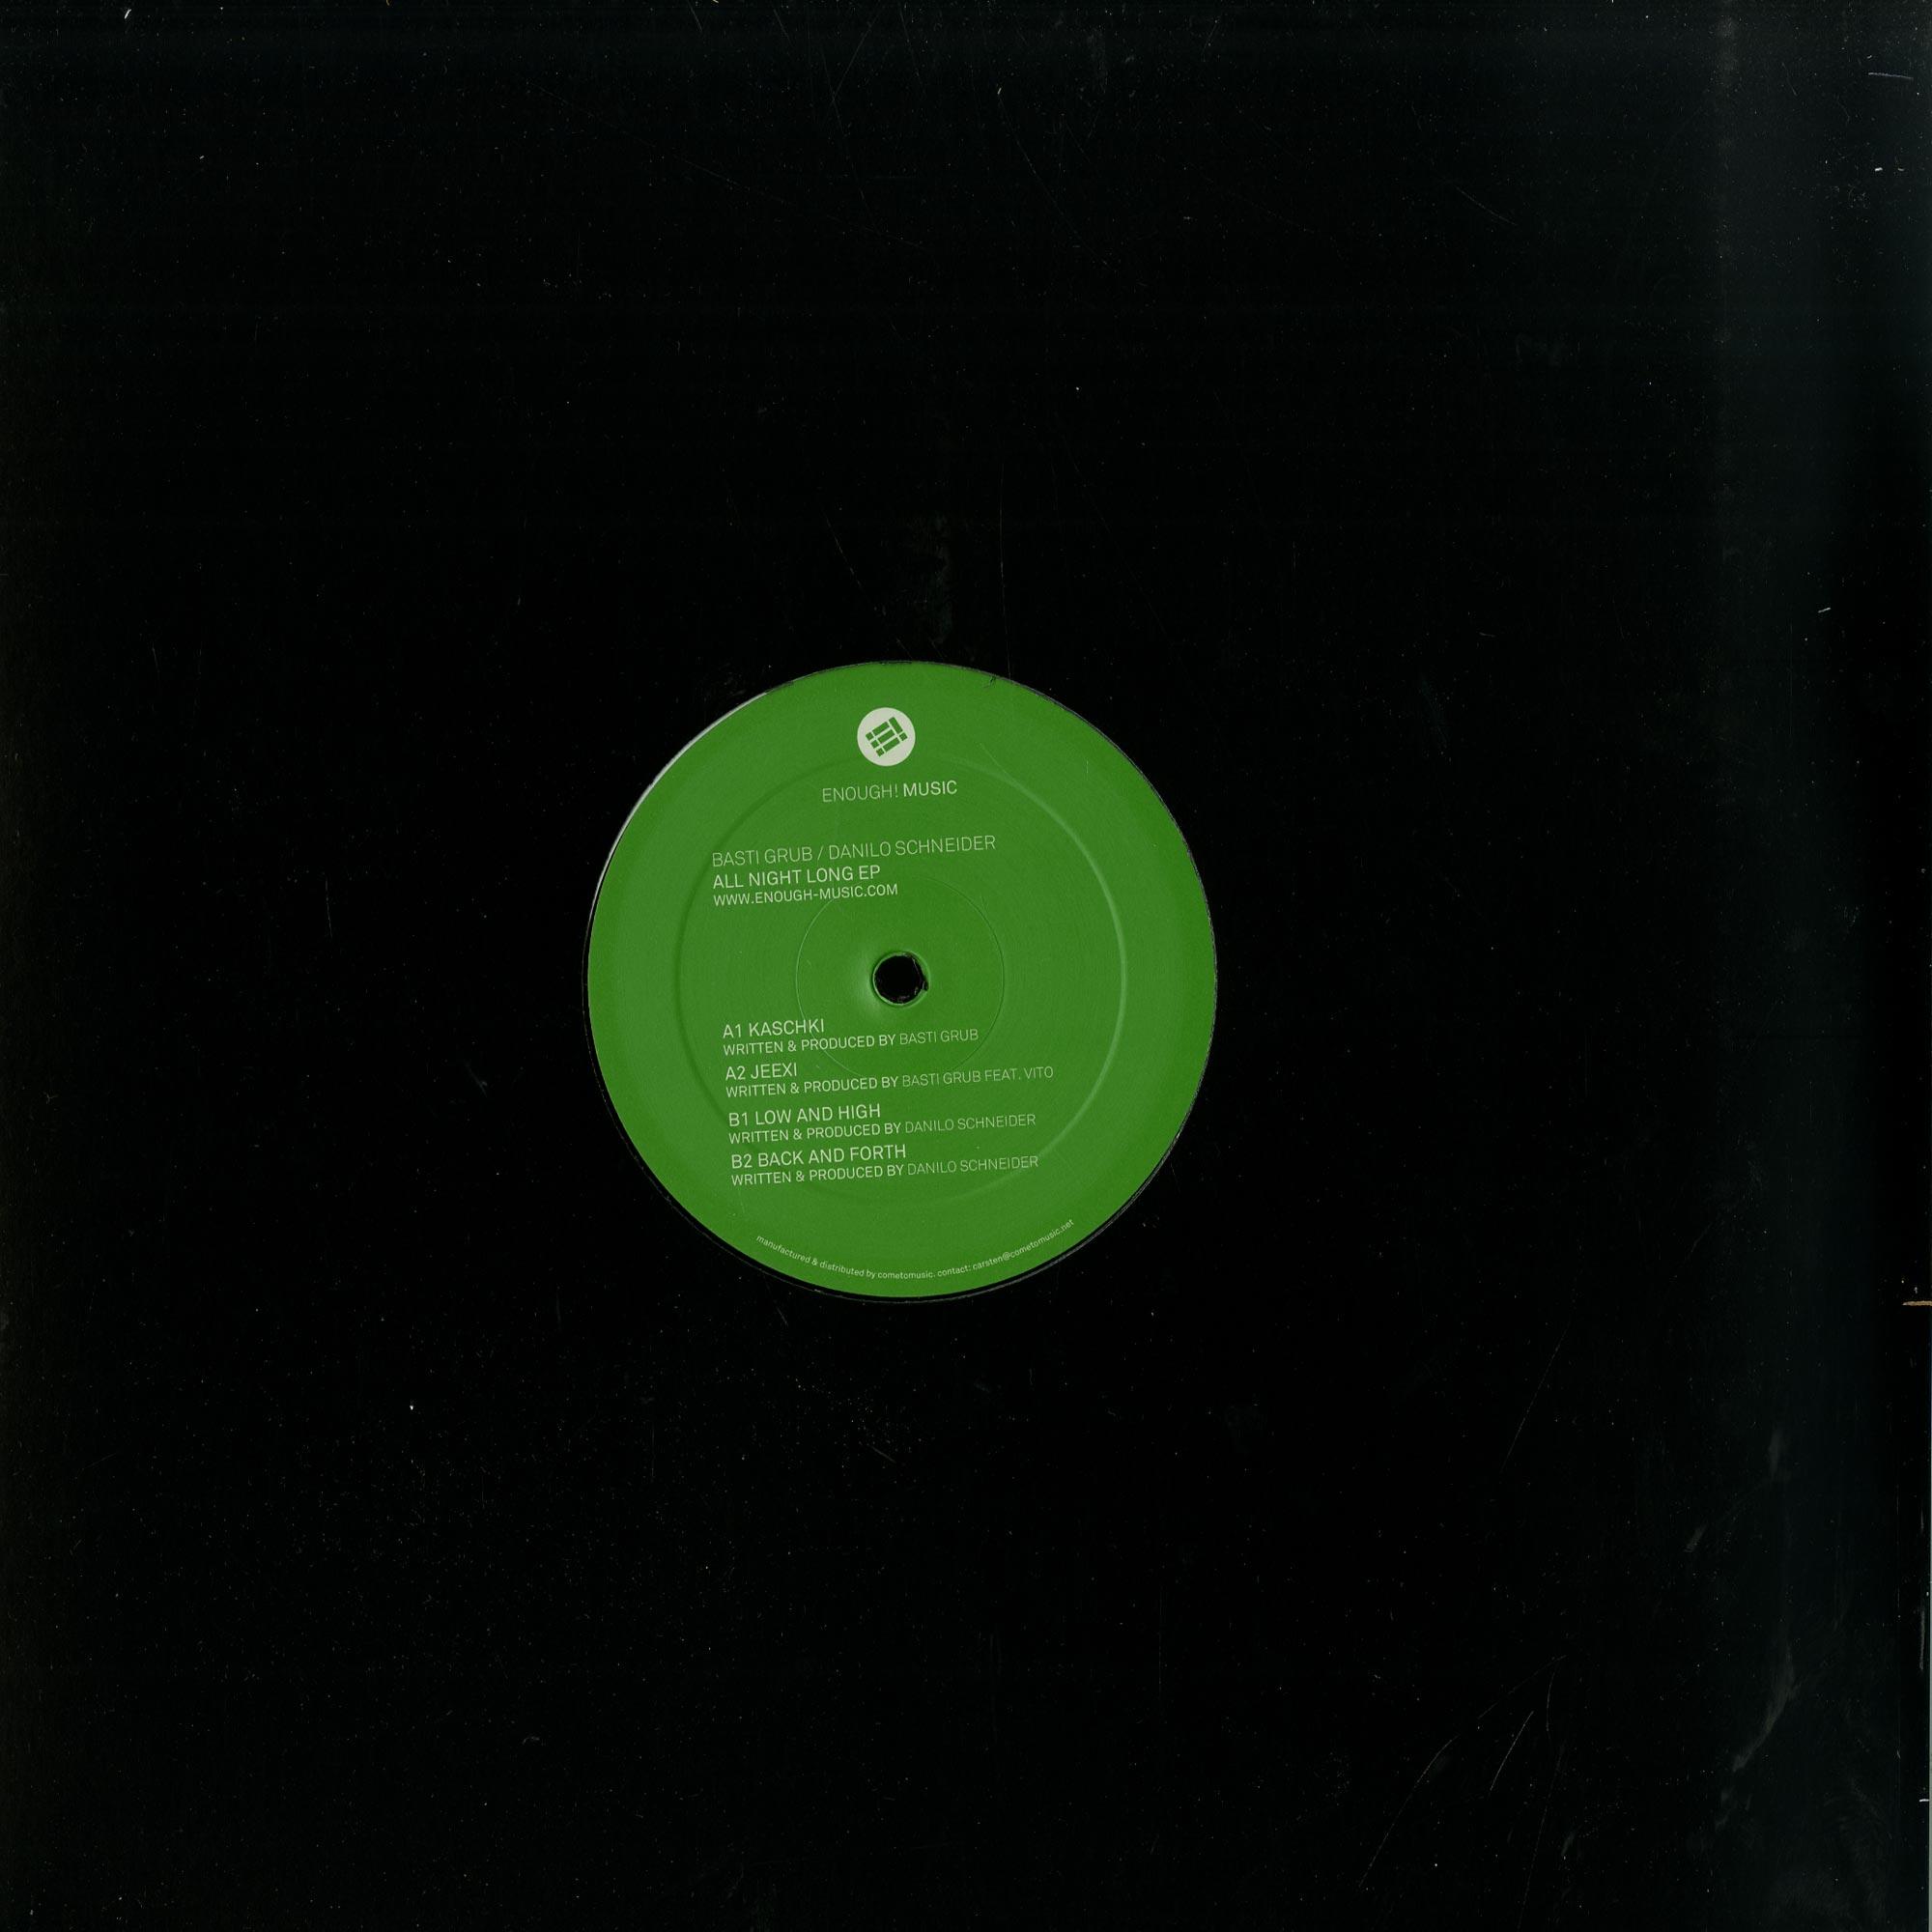 Basti Grub / Danilo Schneider - ALL NIGHT LONG EP